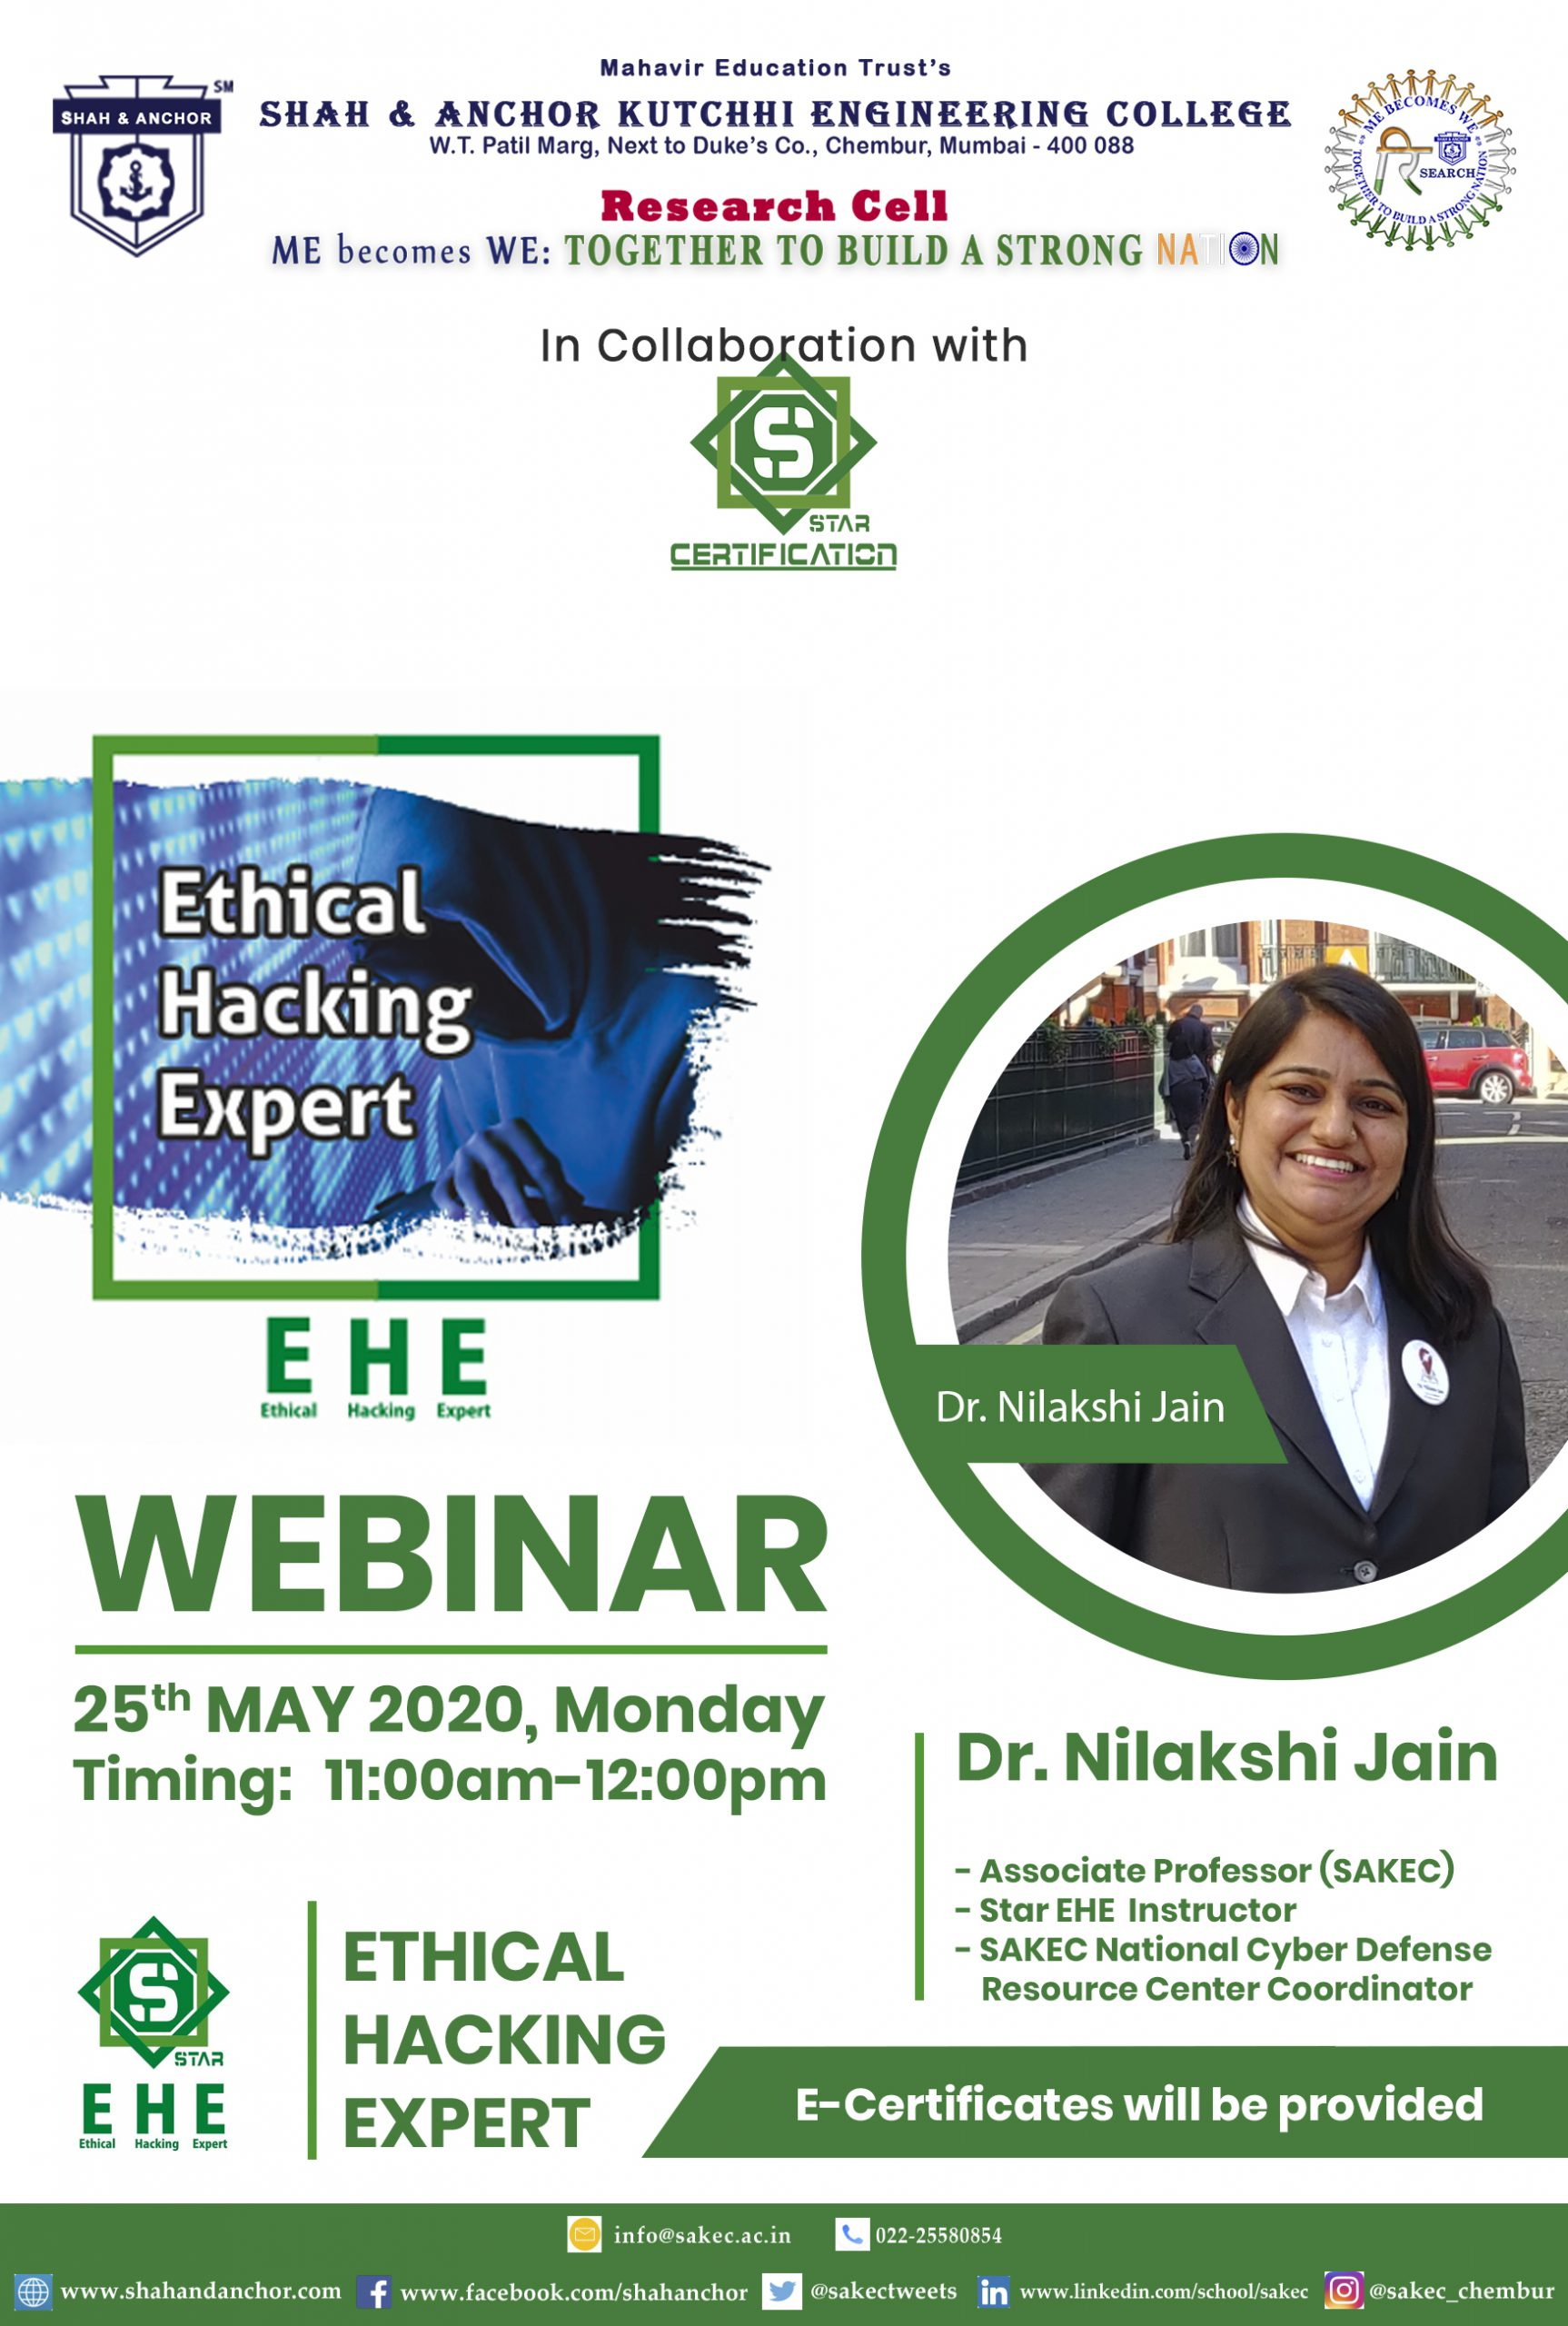 Free Webinar on Star Ethical Hacking Expert